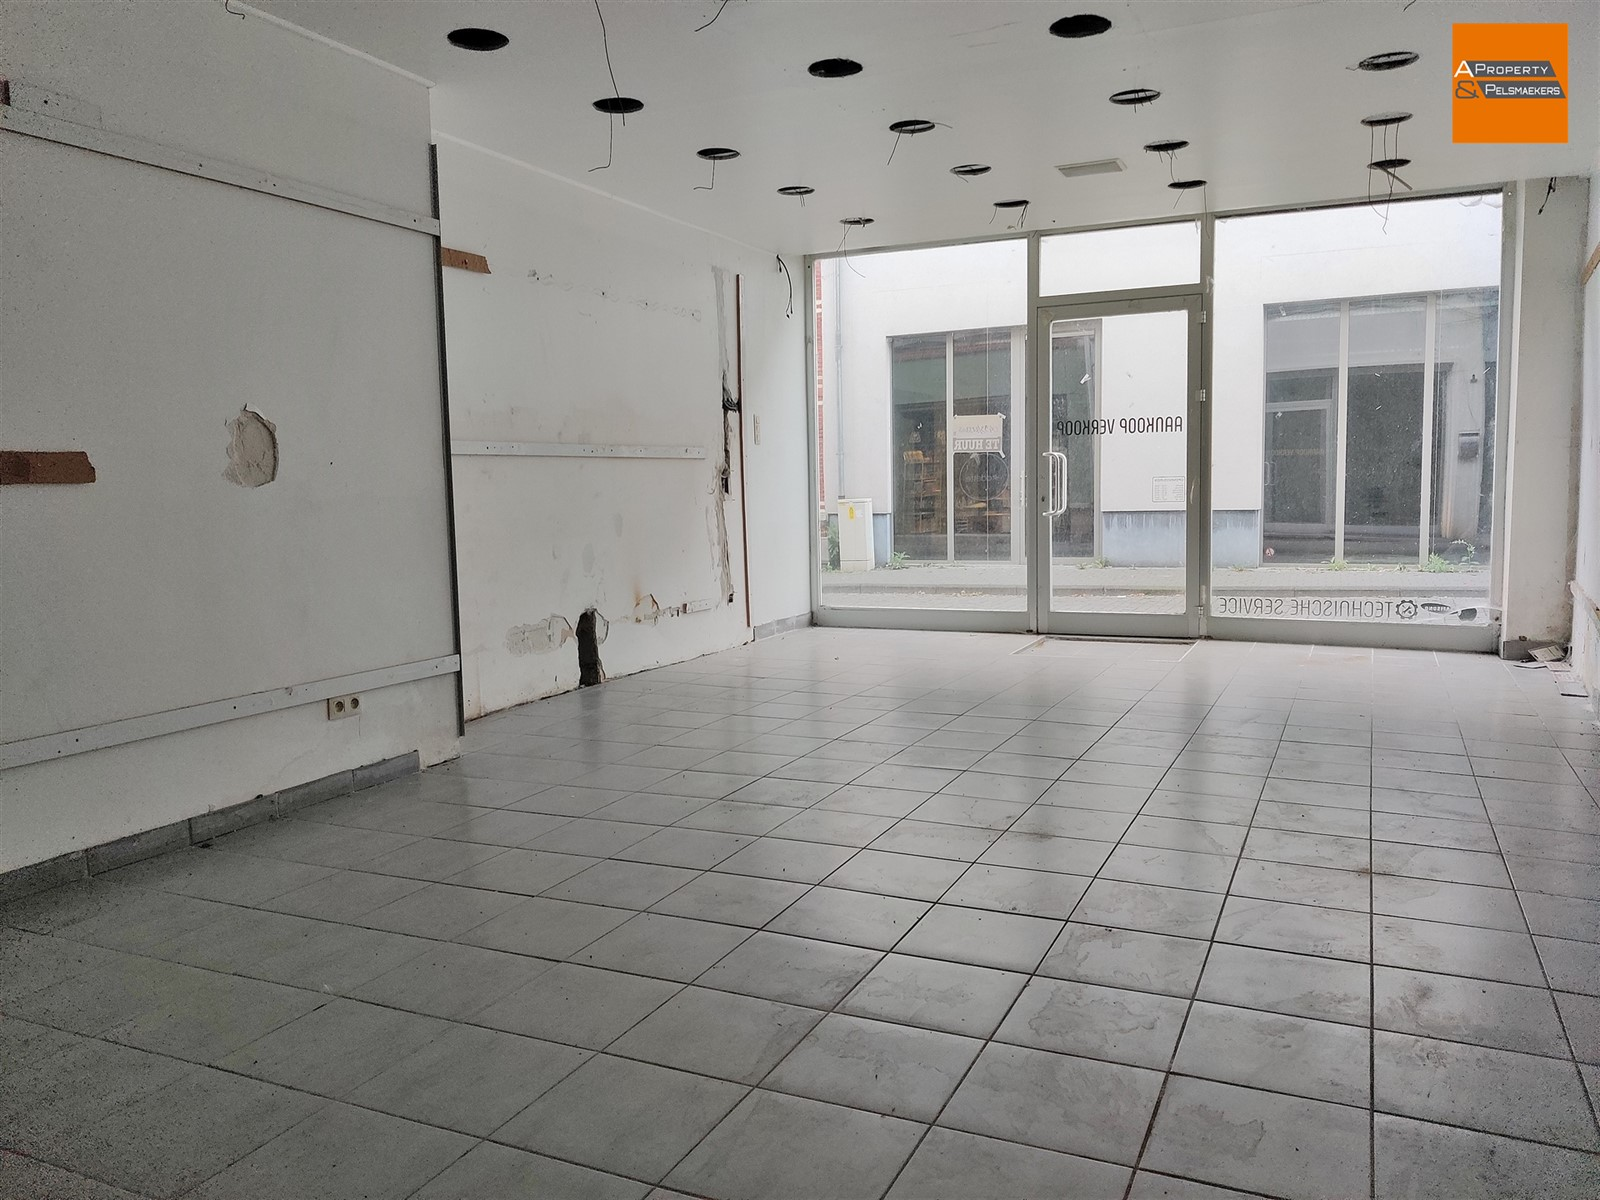 Foto 3 : Handelspand in 3290 DIEST (België) - Prijs € 800